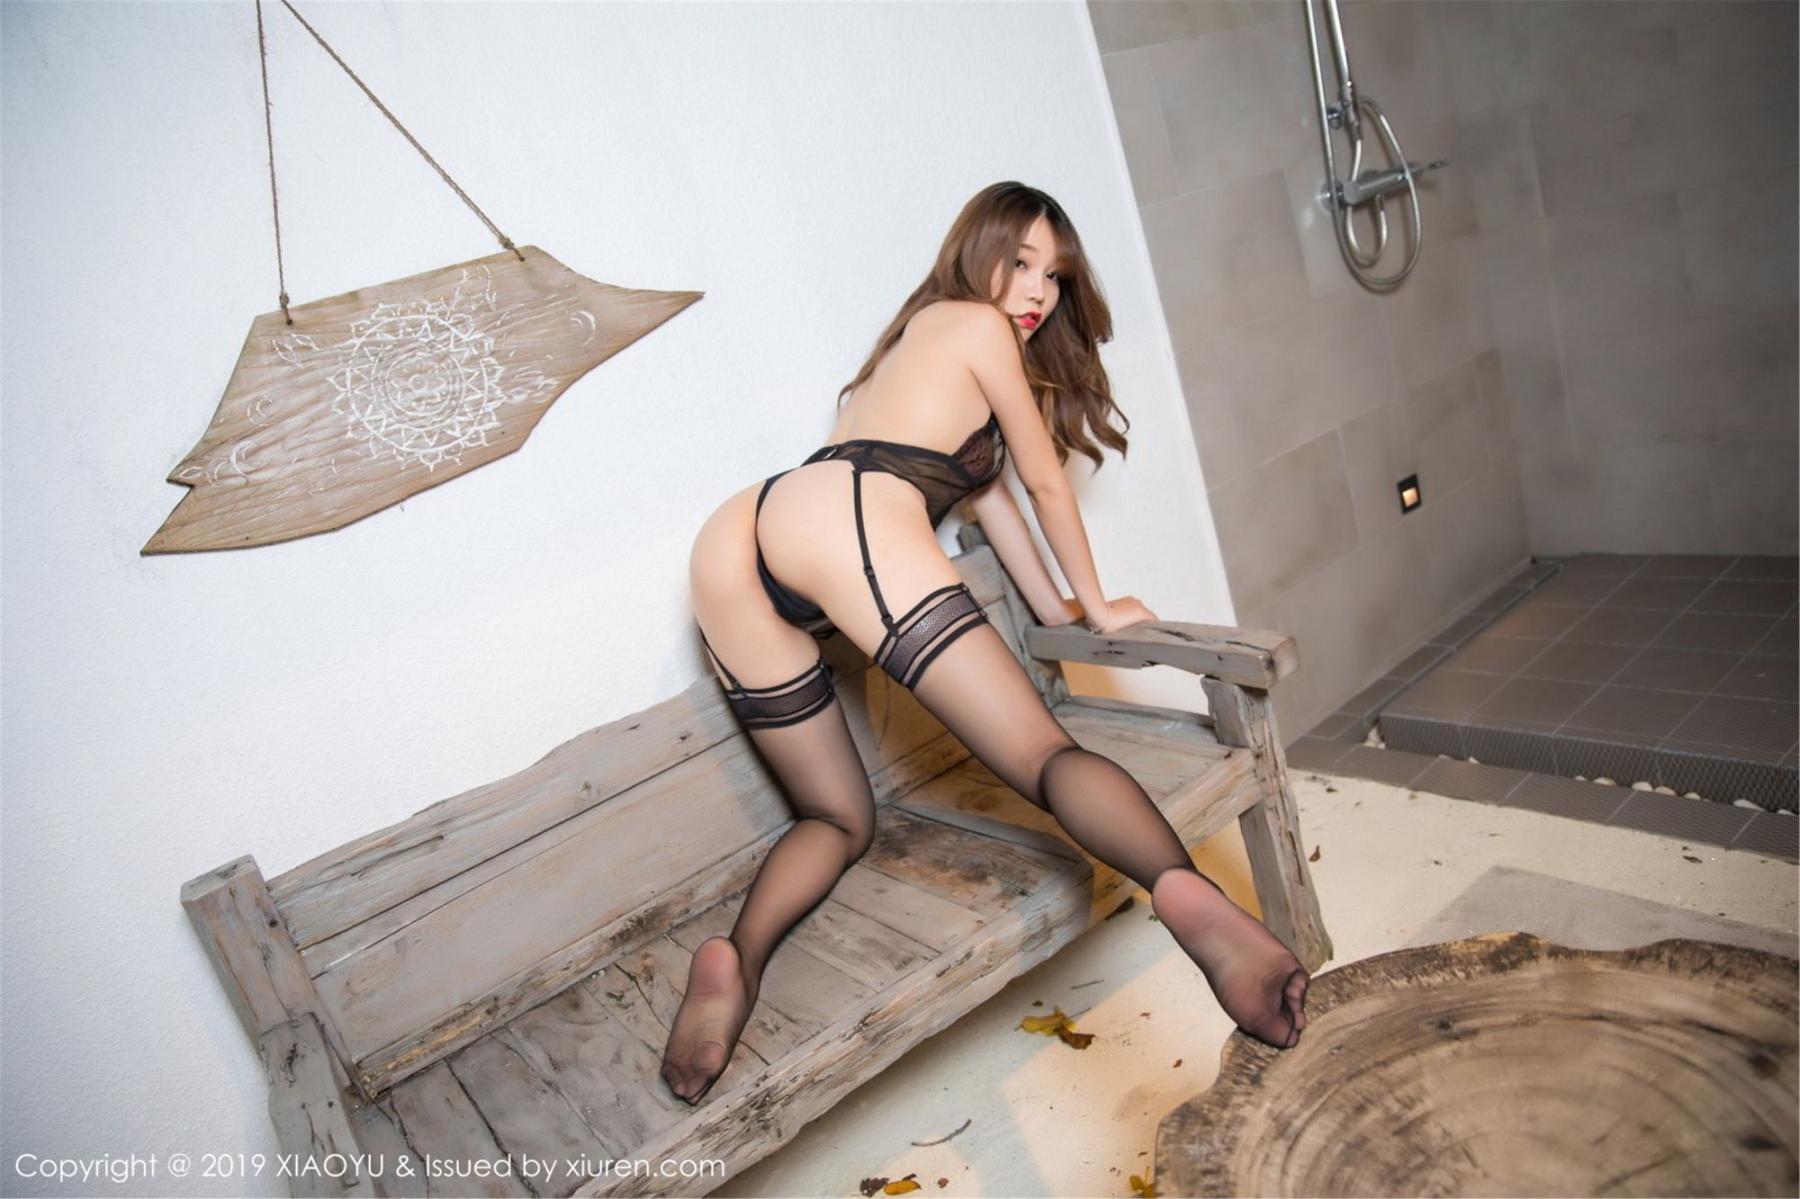 [XiaoYu] Vol.063 Booty 13P, Bathroom, Big Booty, Black Silk, Chen Zhi, XiaoYu